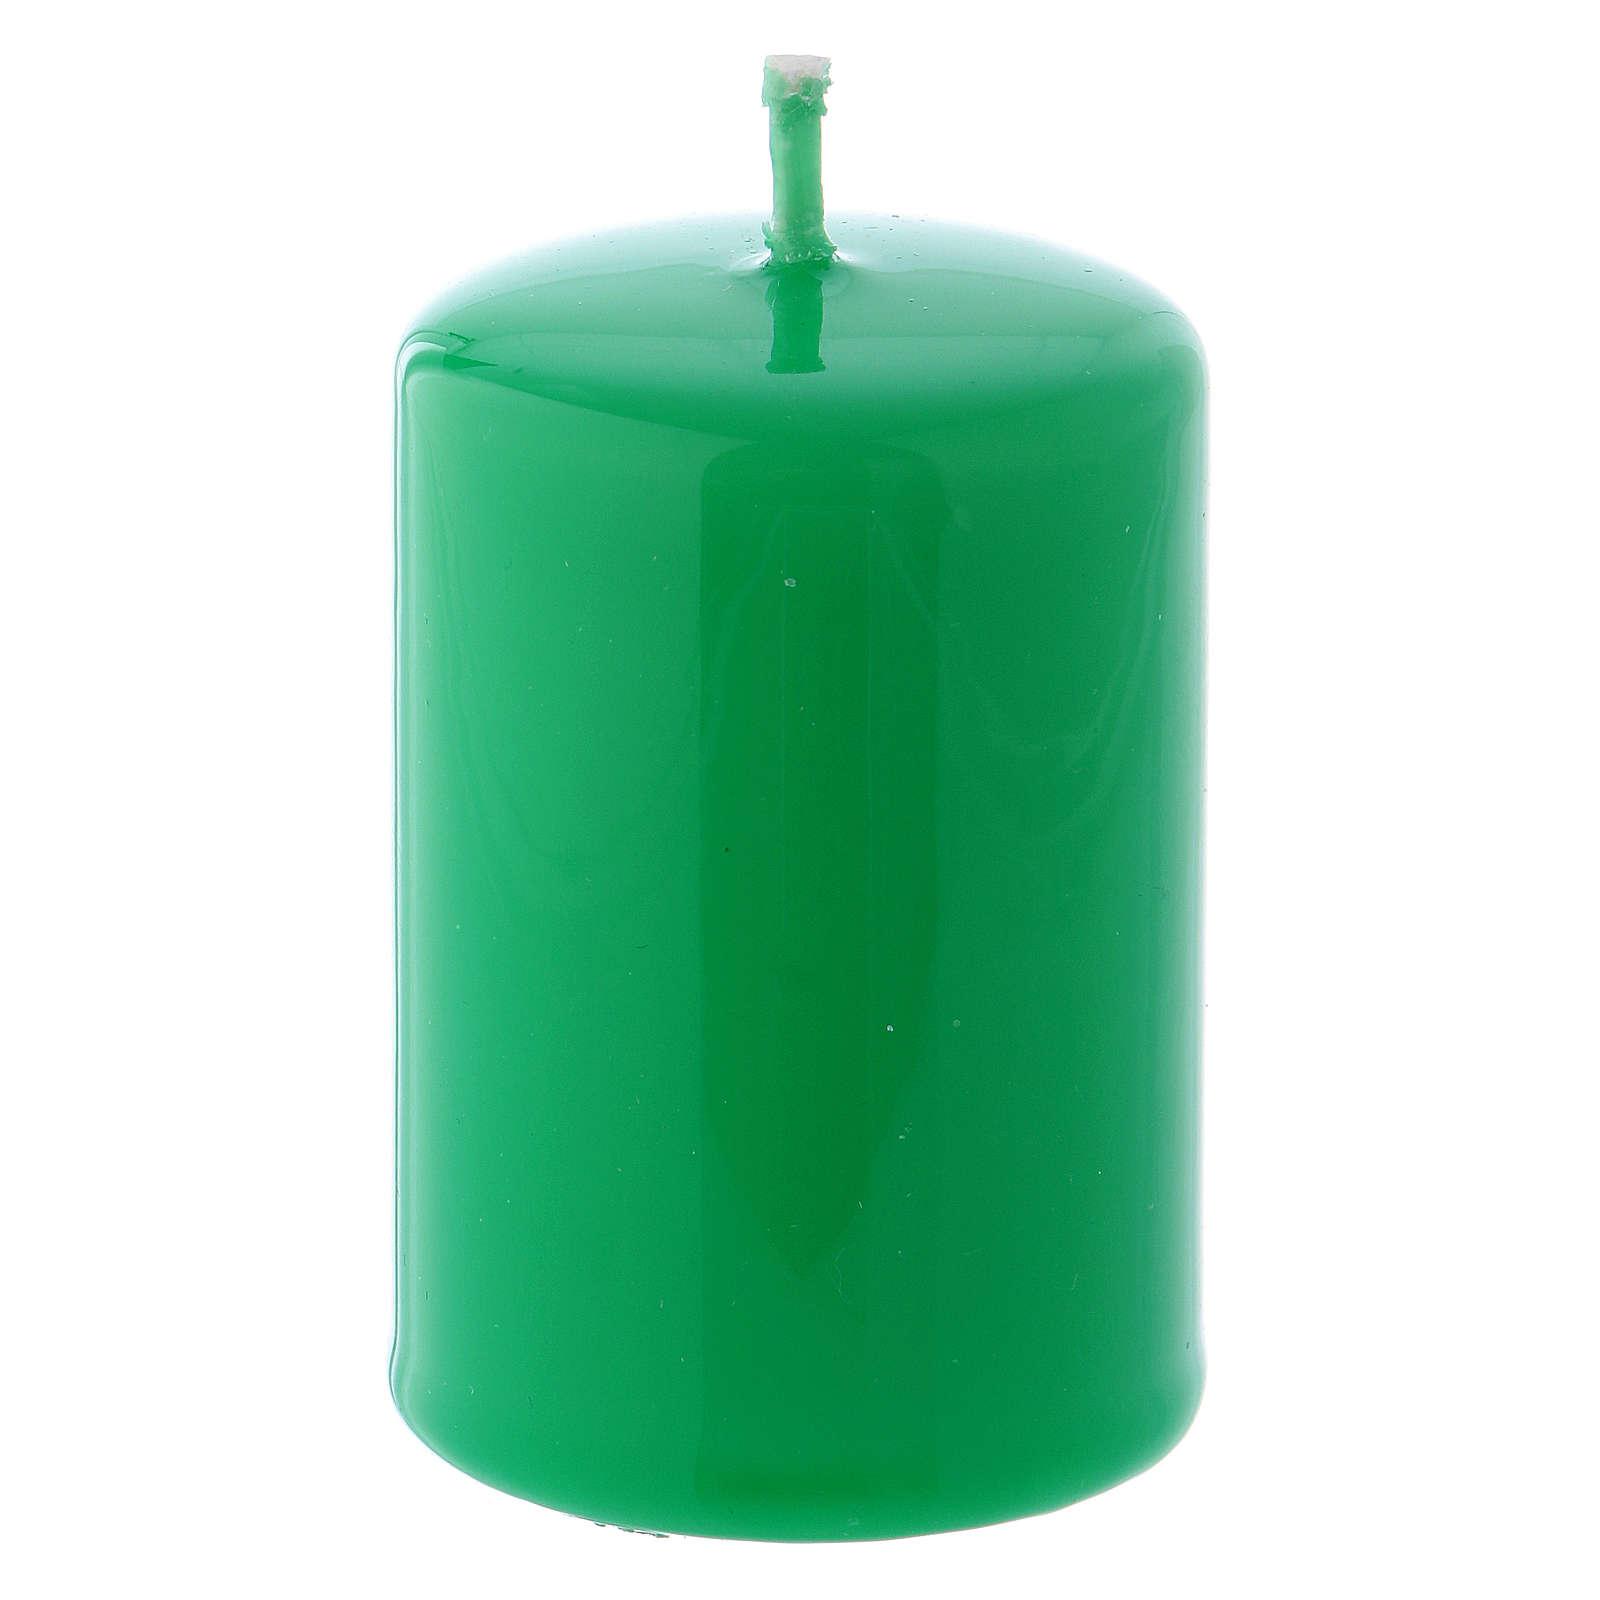 Vela Lúcida Lacre 4x6 cm verde 3